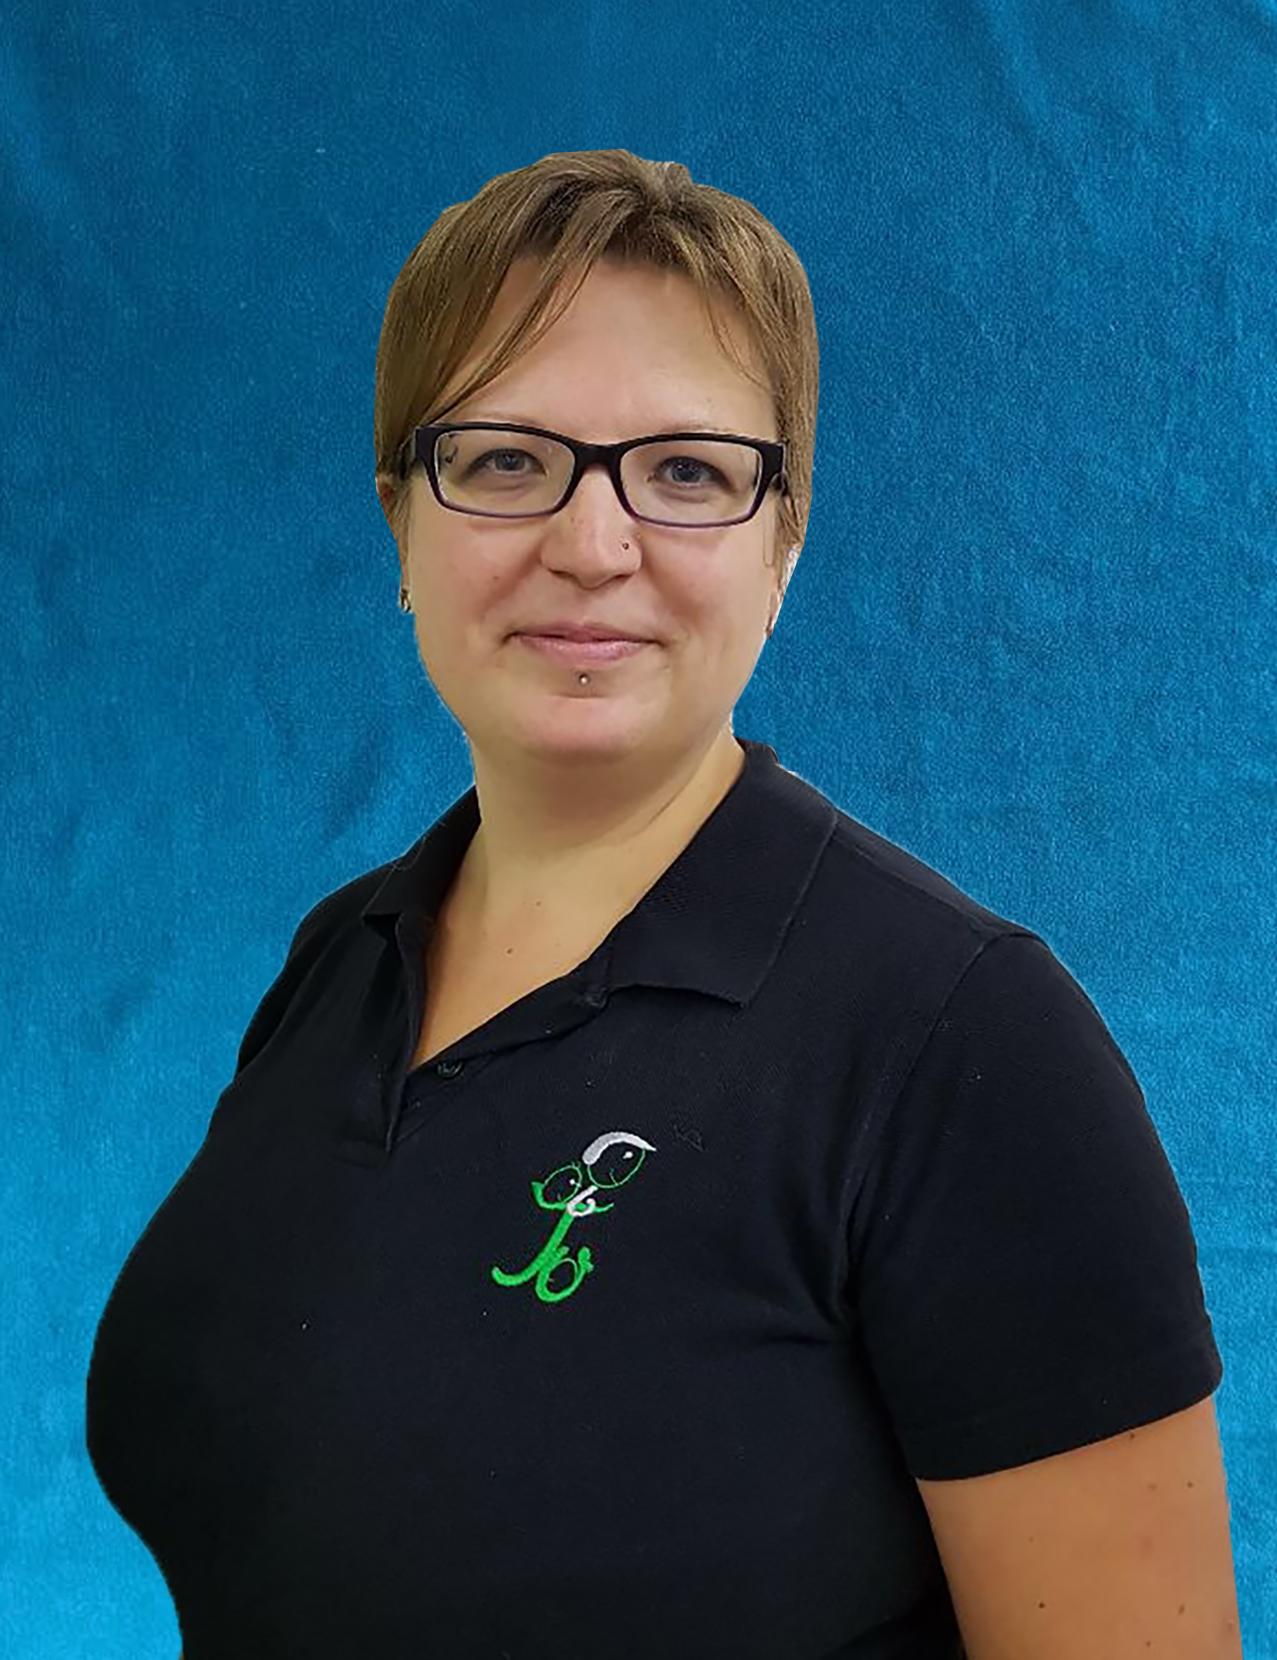 Trageberatung Vorarlberg Sandra Rothe